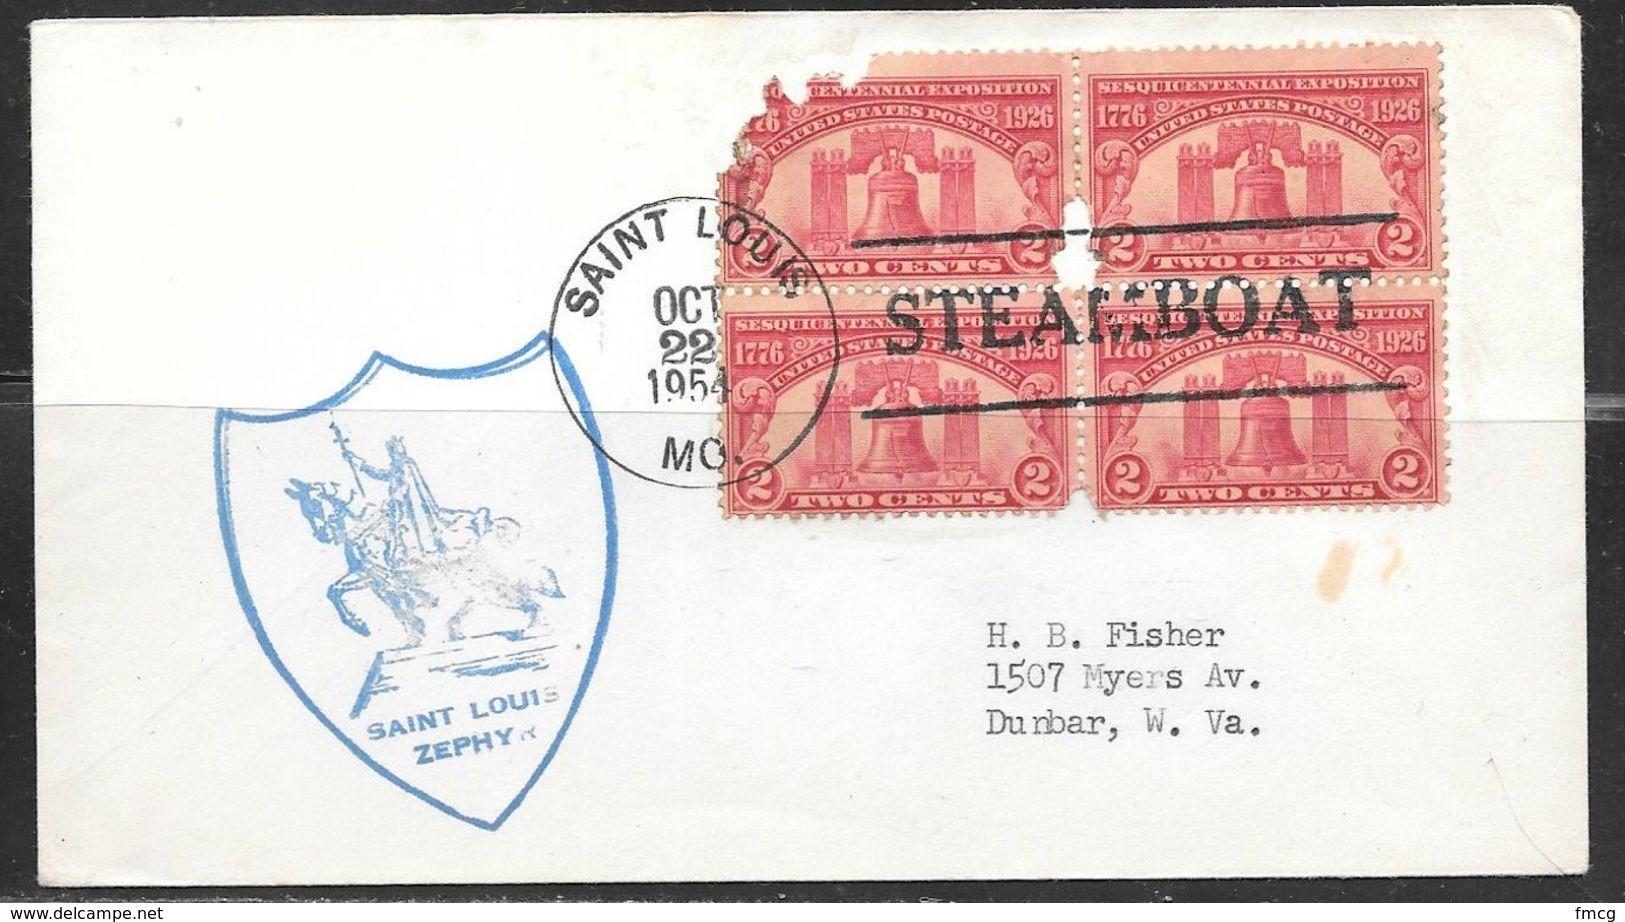 1954 St. Louis Missouri Steamboat Cancel, Oct. 22, 1954 - Ships